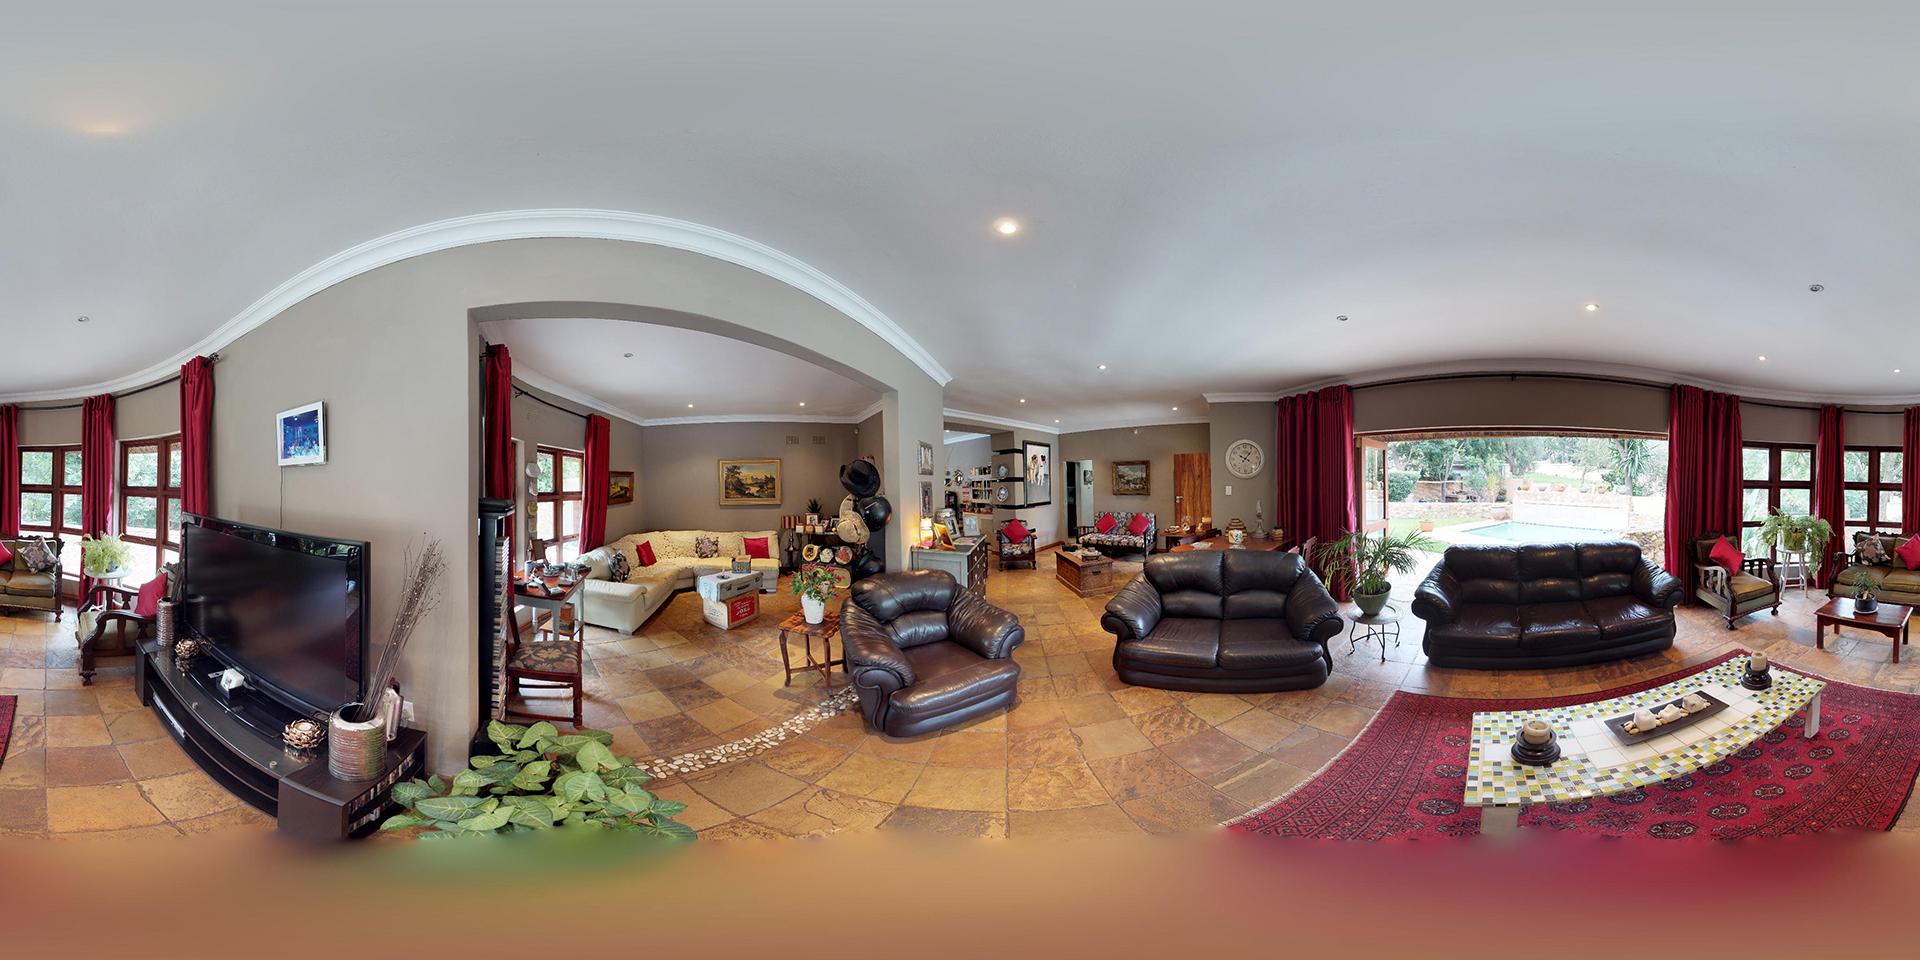 360-panorama-image